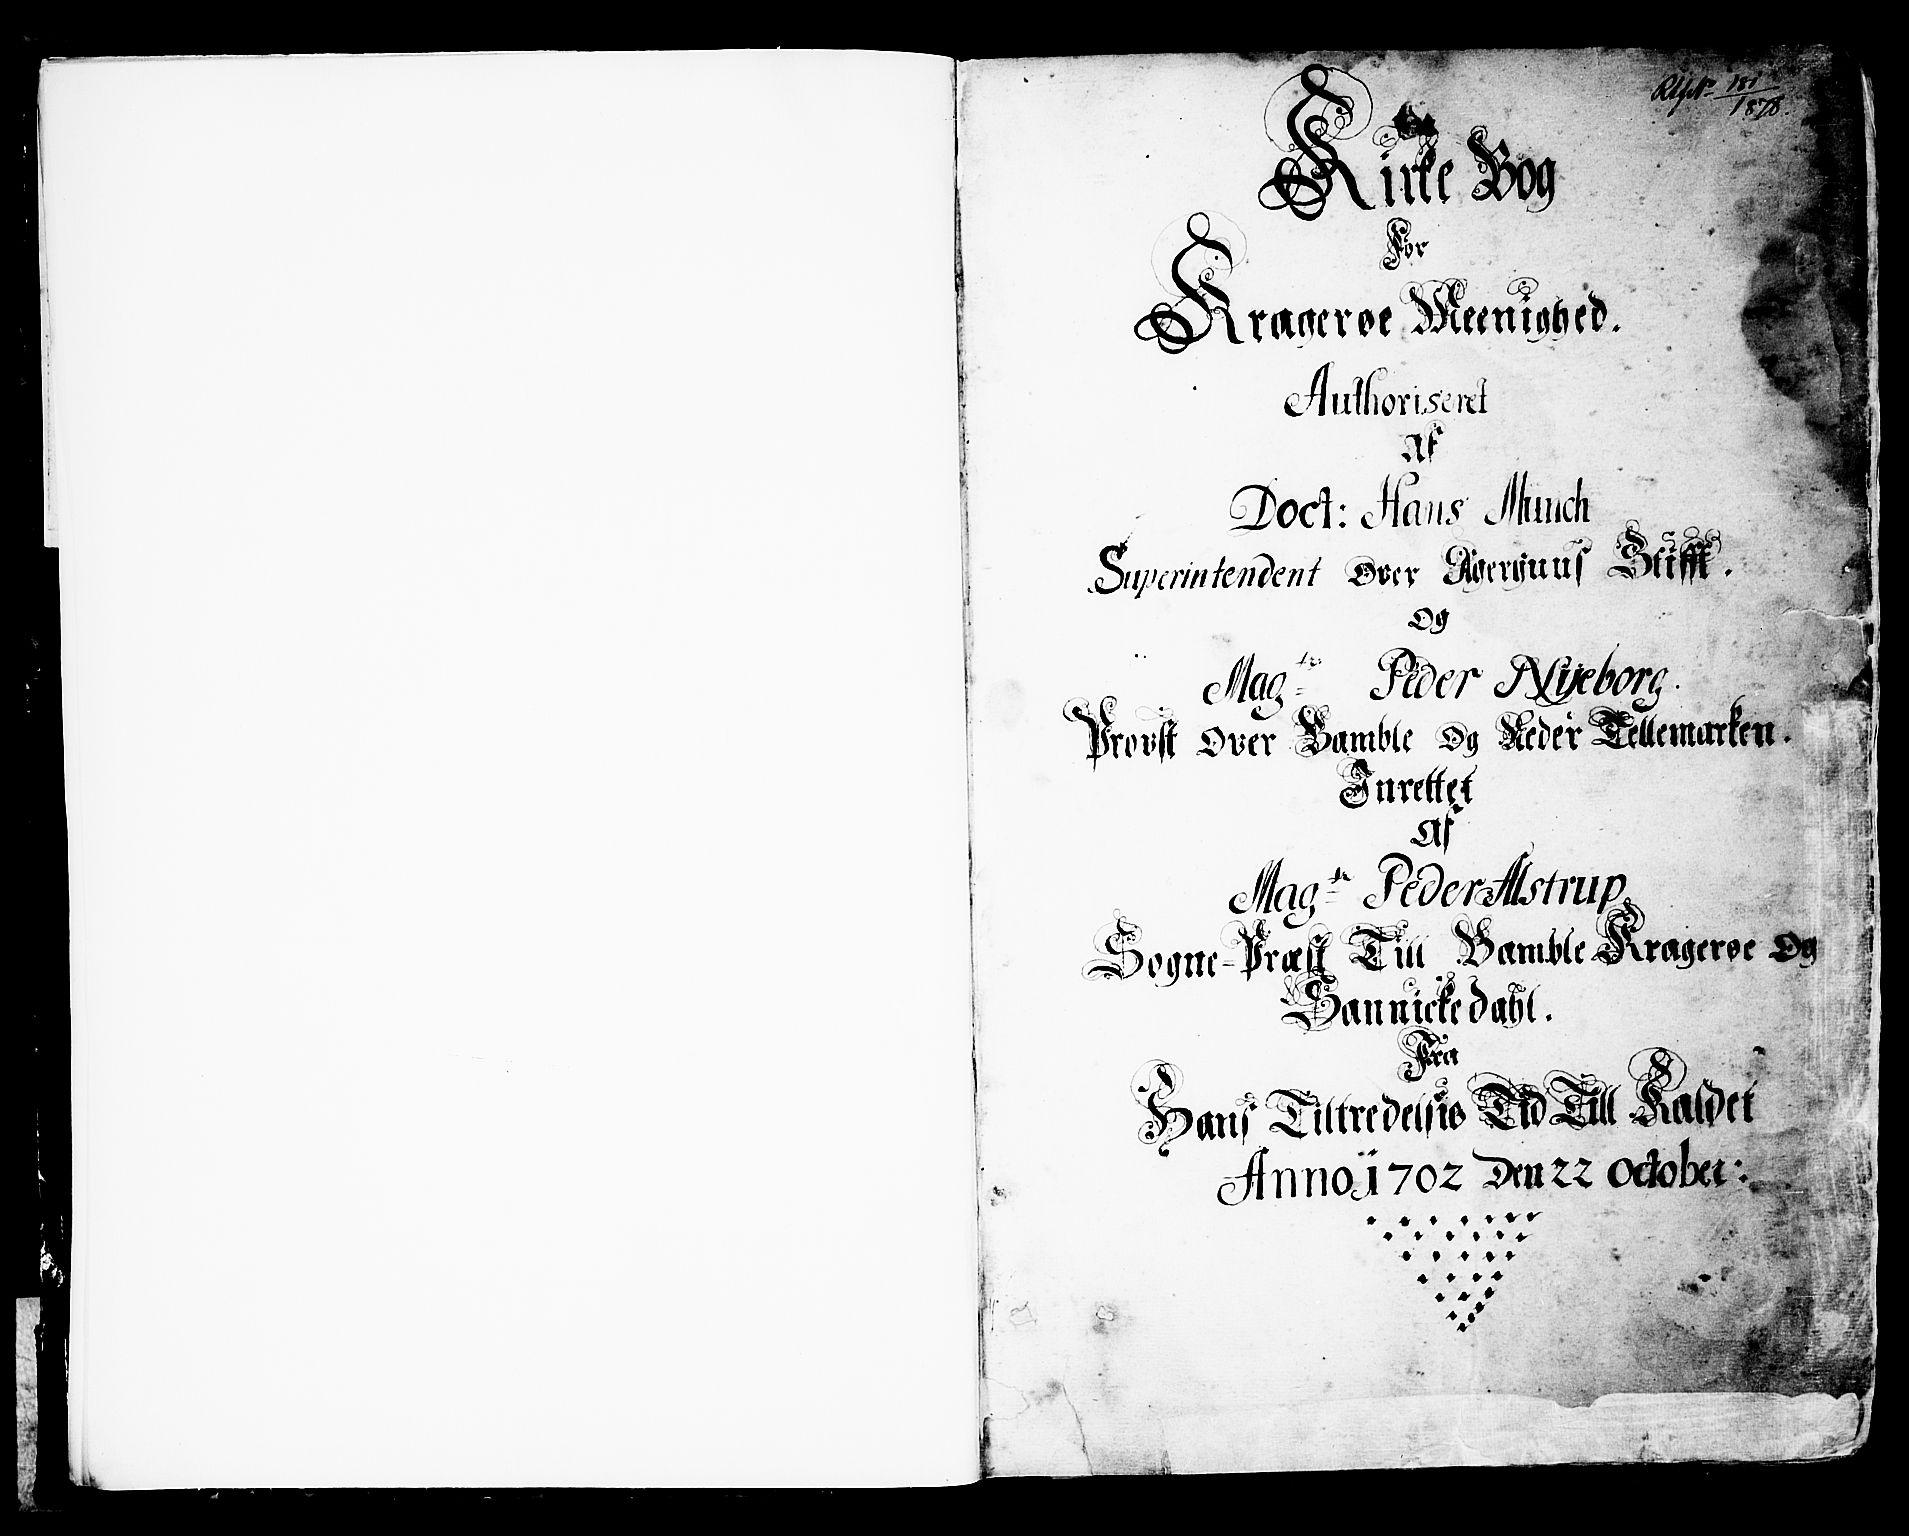 SAKO, Kragerø kirkebøker, F/Fa/L0001: Ministerialbok nr. 1, 1702-1766